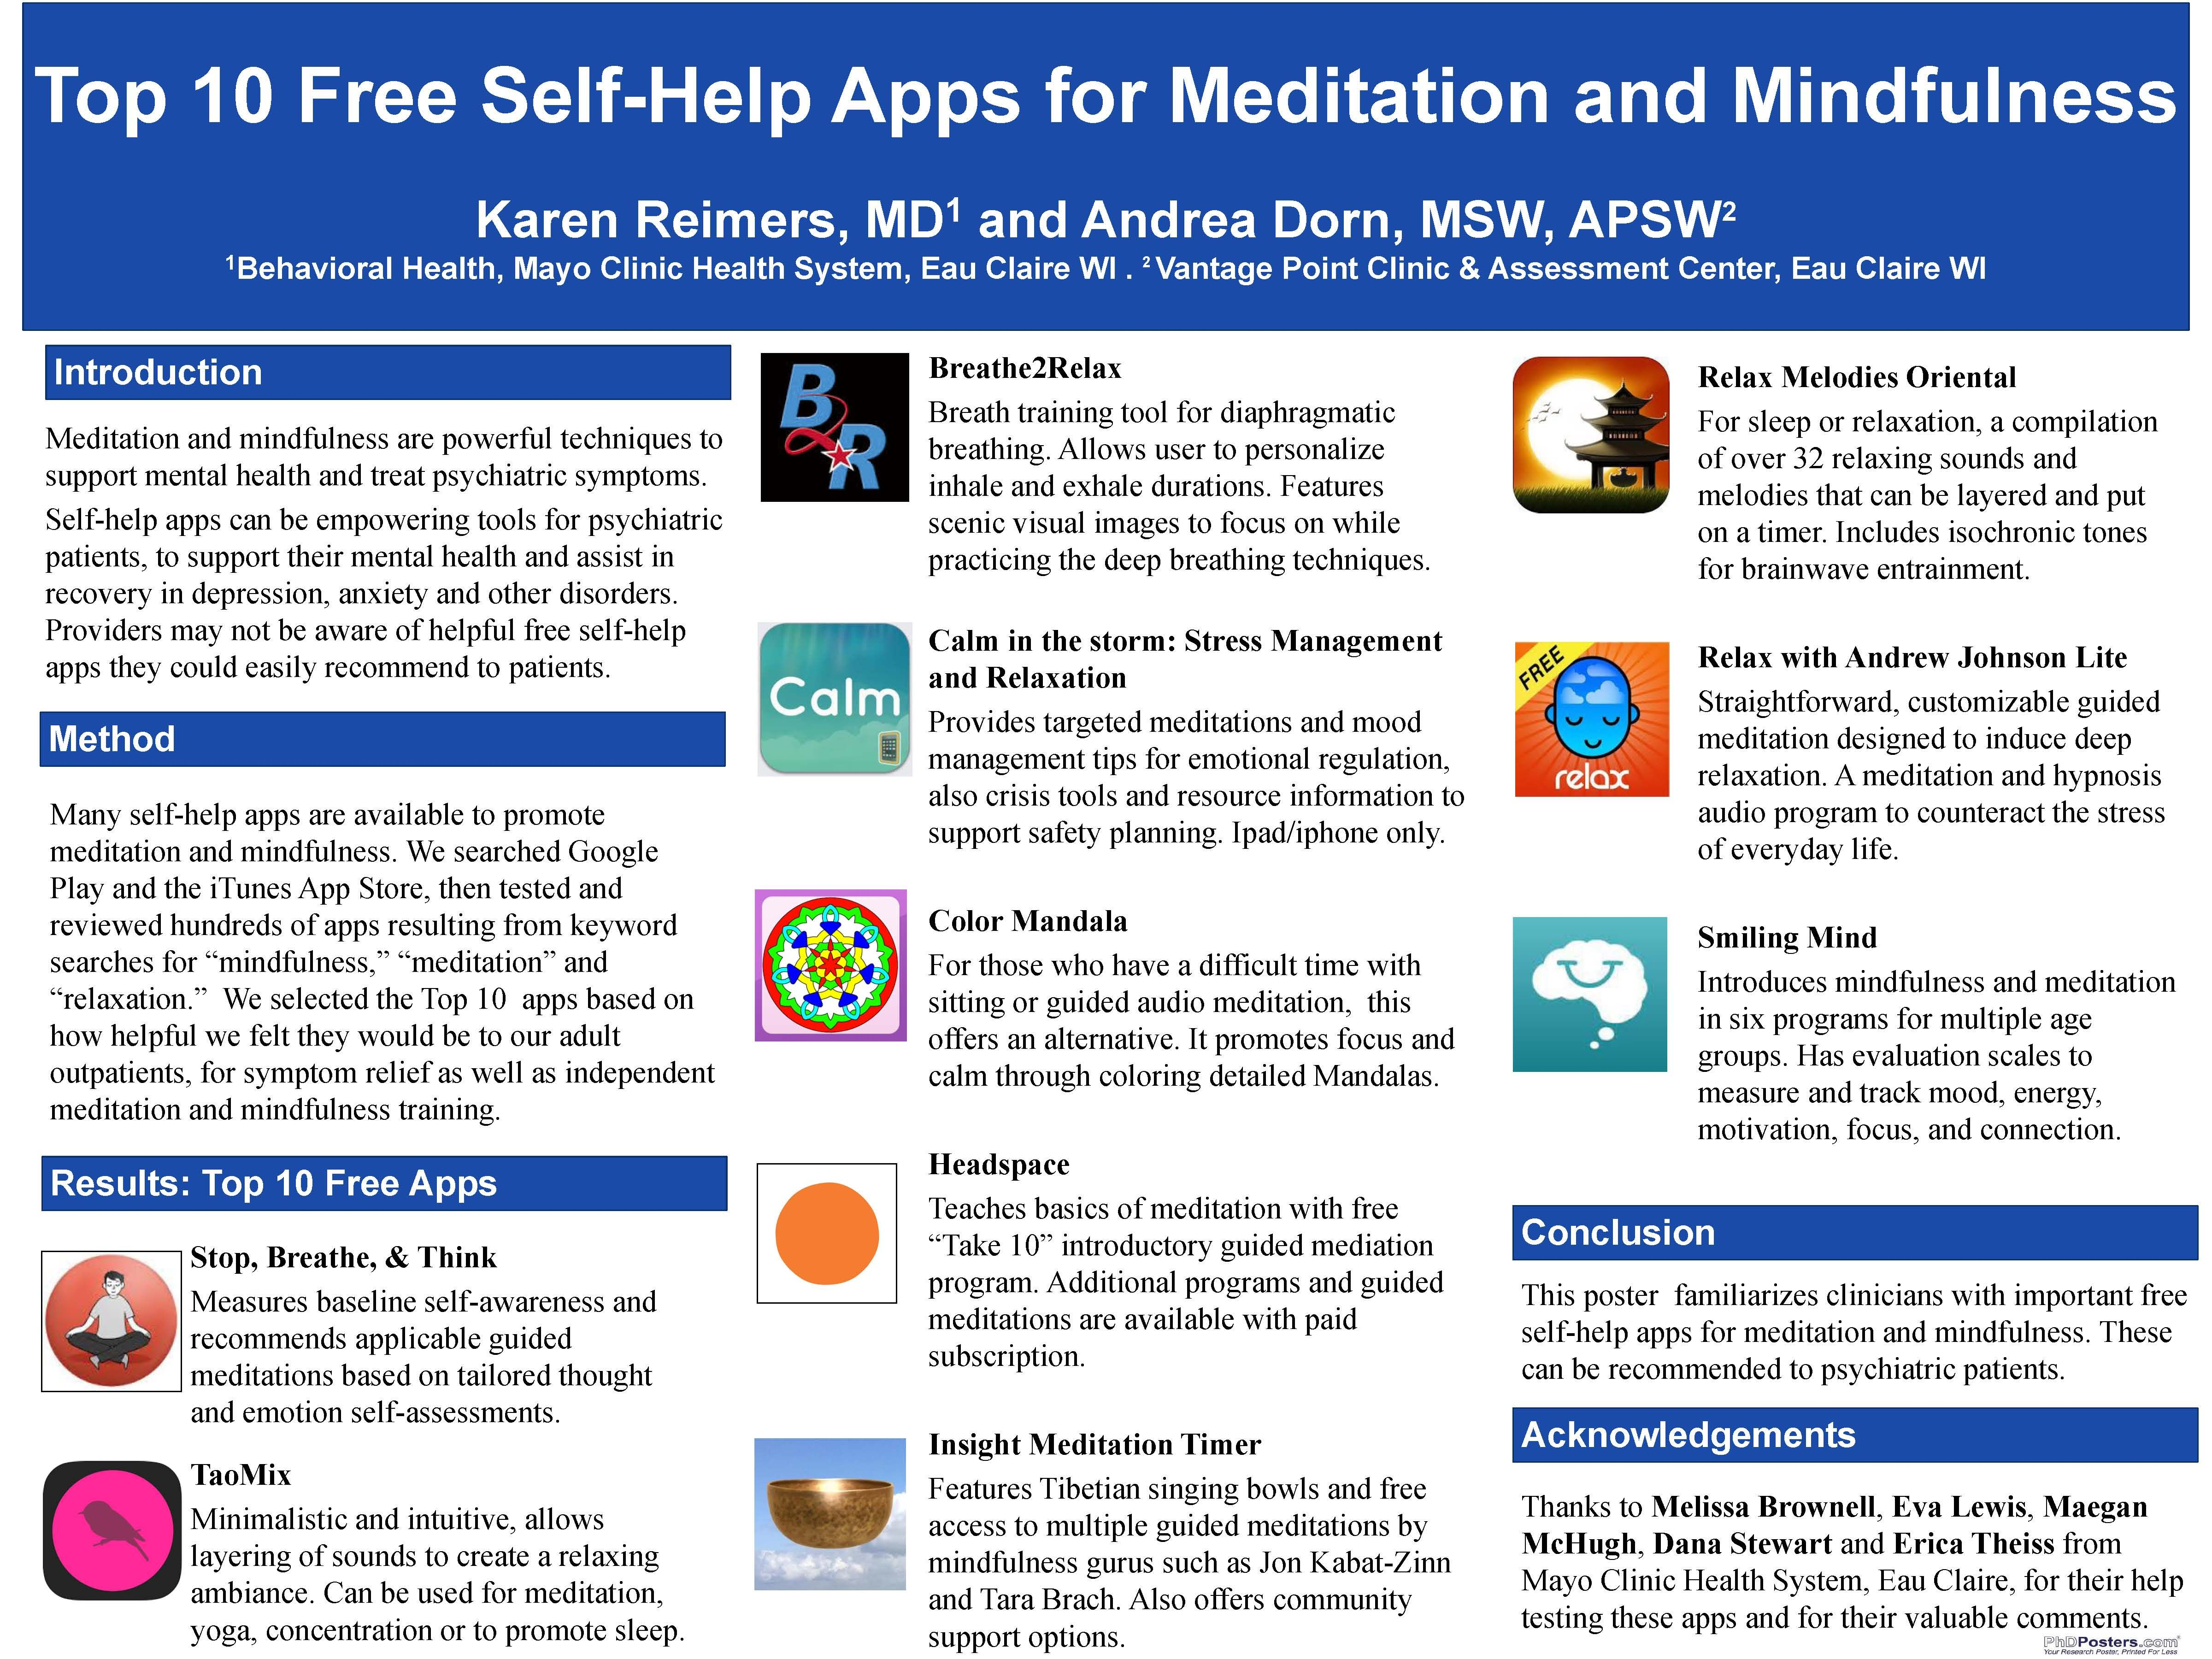 Top 10 apps for mindfulness and meditation Meditation